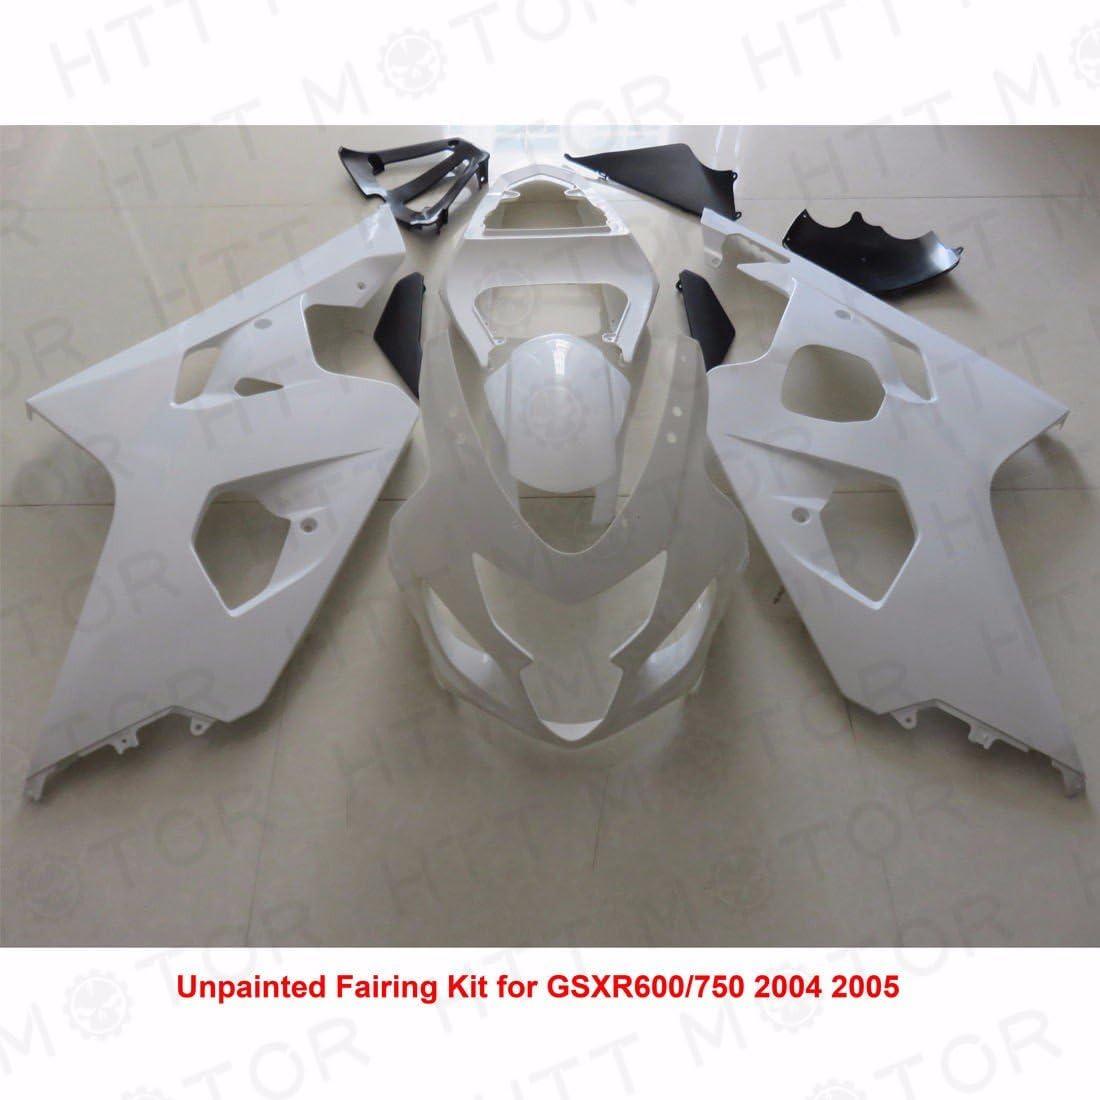 B01MV11NBA XKMT-Unpainted ABS Plastic Injection Fairings Bodywork Compatible With 04-05 Suzuki GSXR 600 750